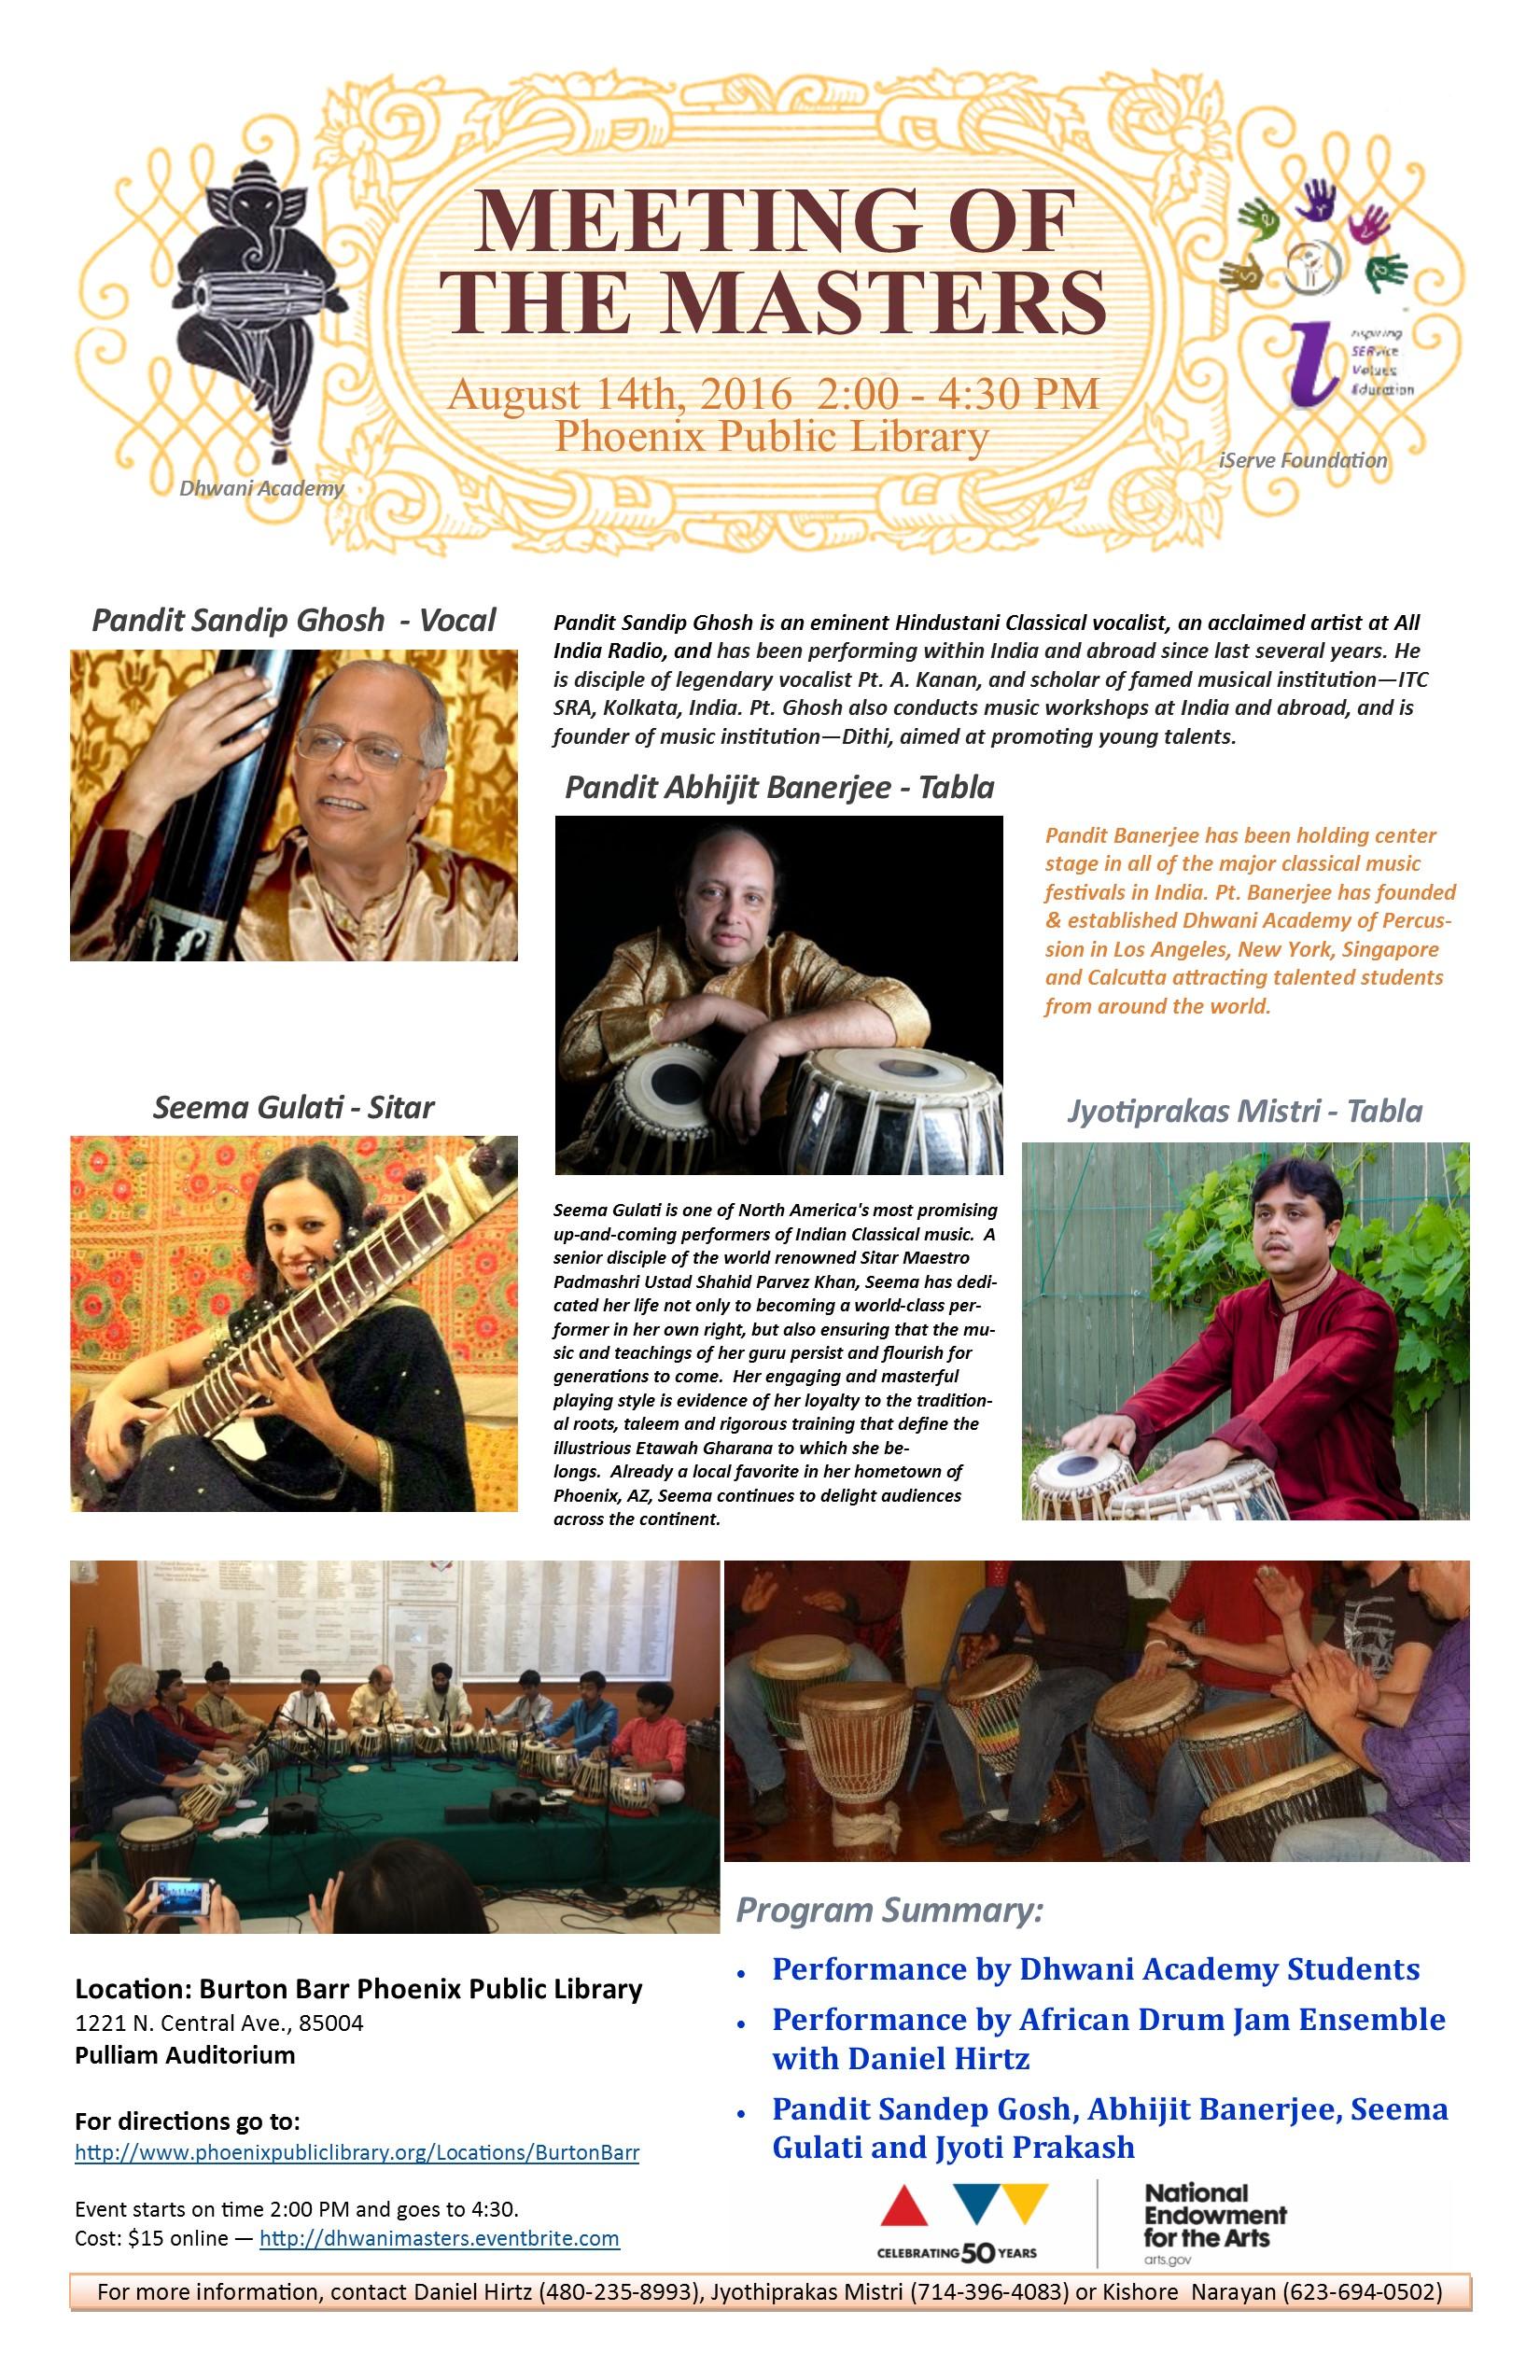 Meeting of the Masters - Dhwani AZ Concert 2016